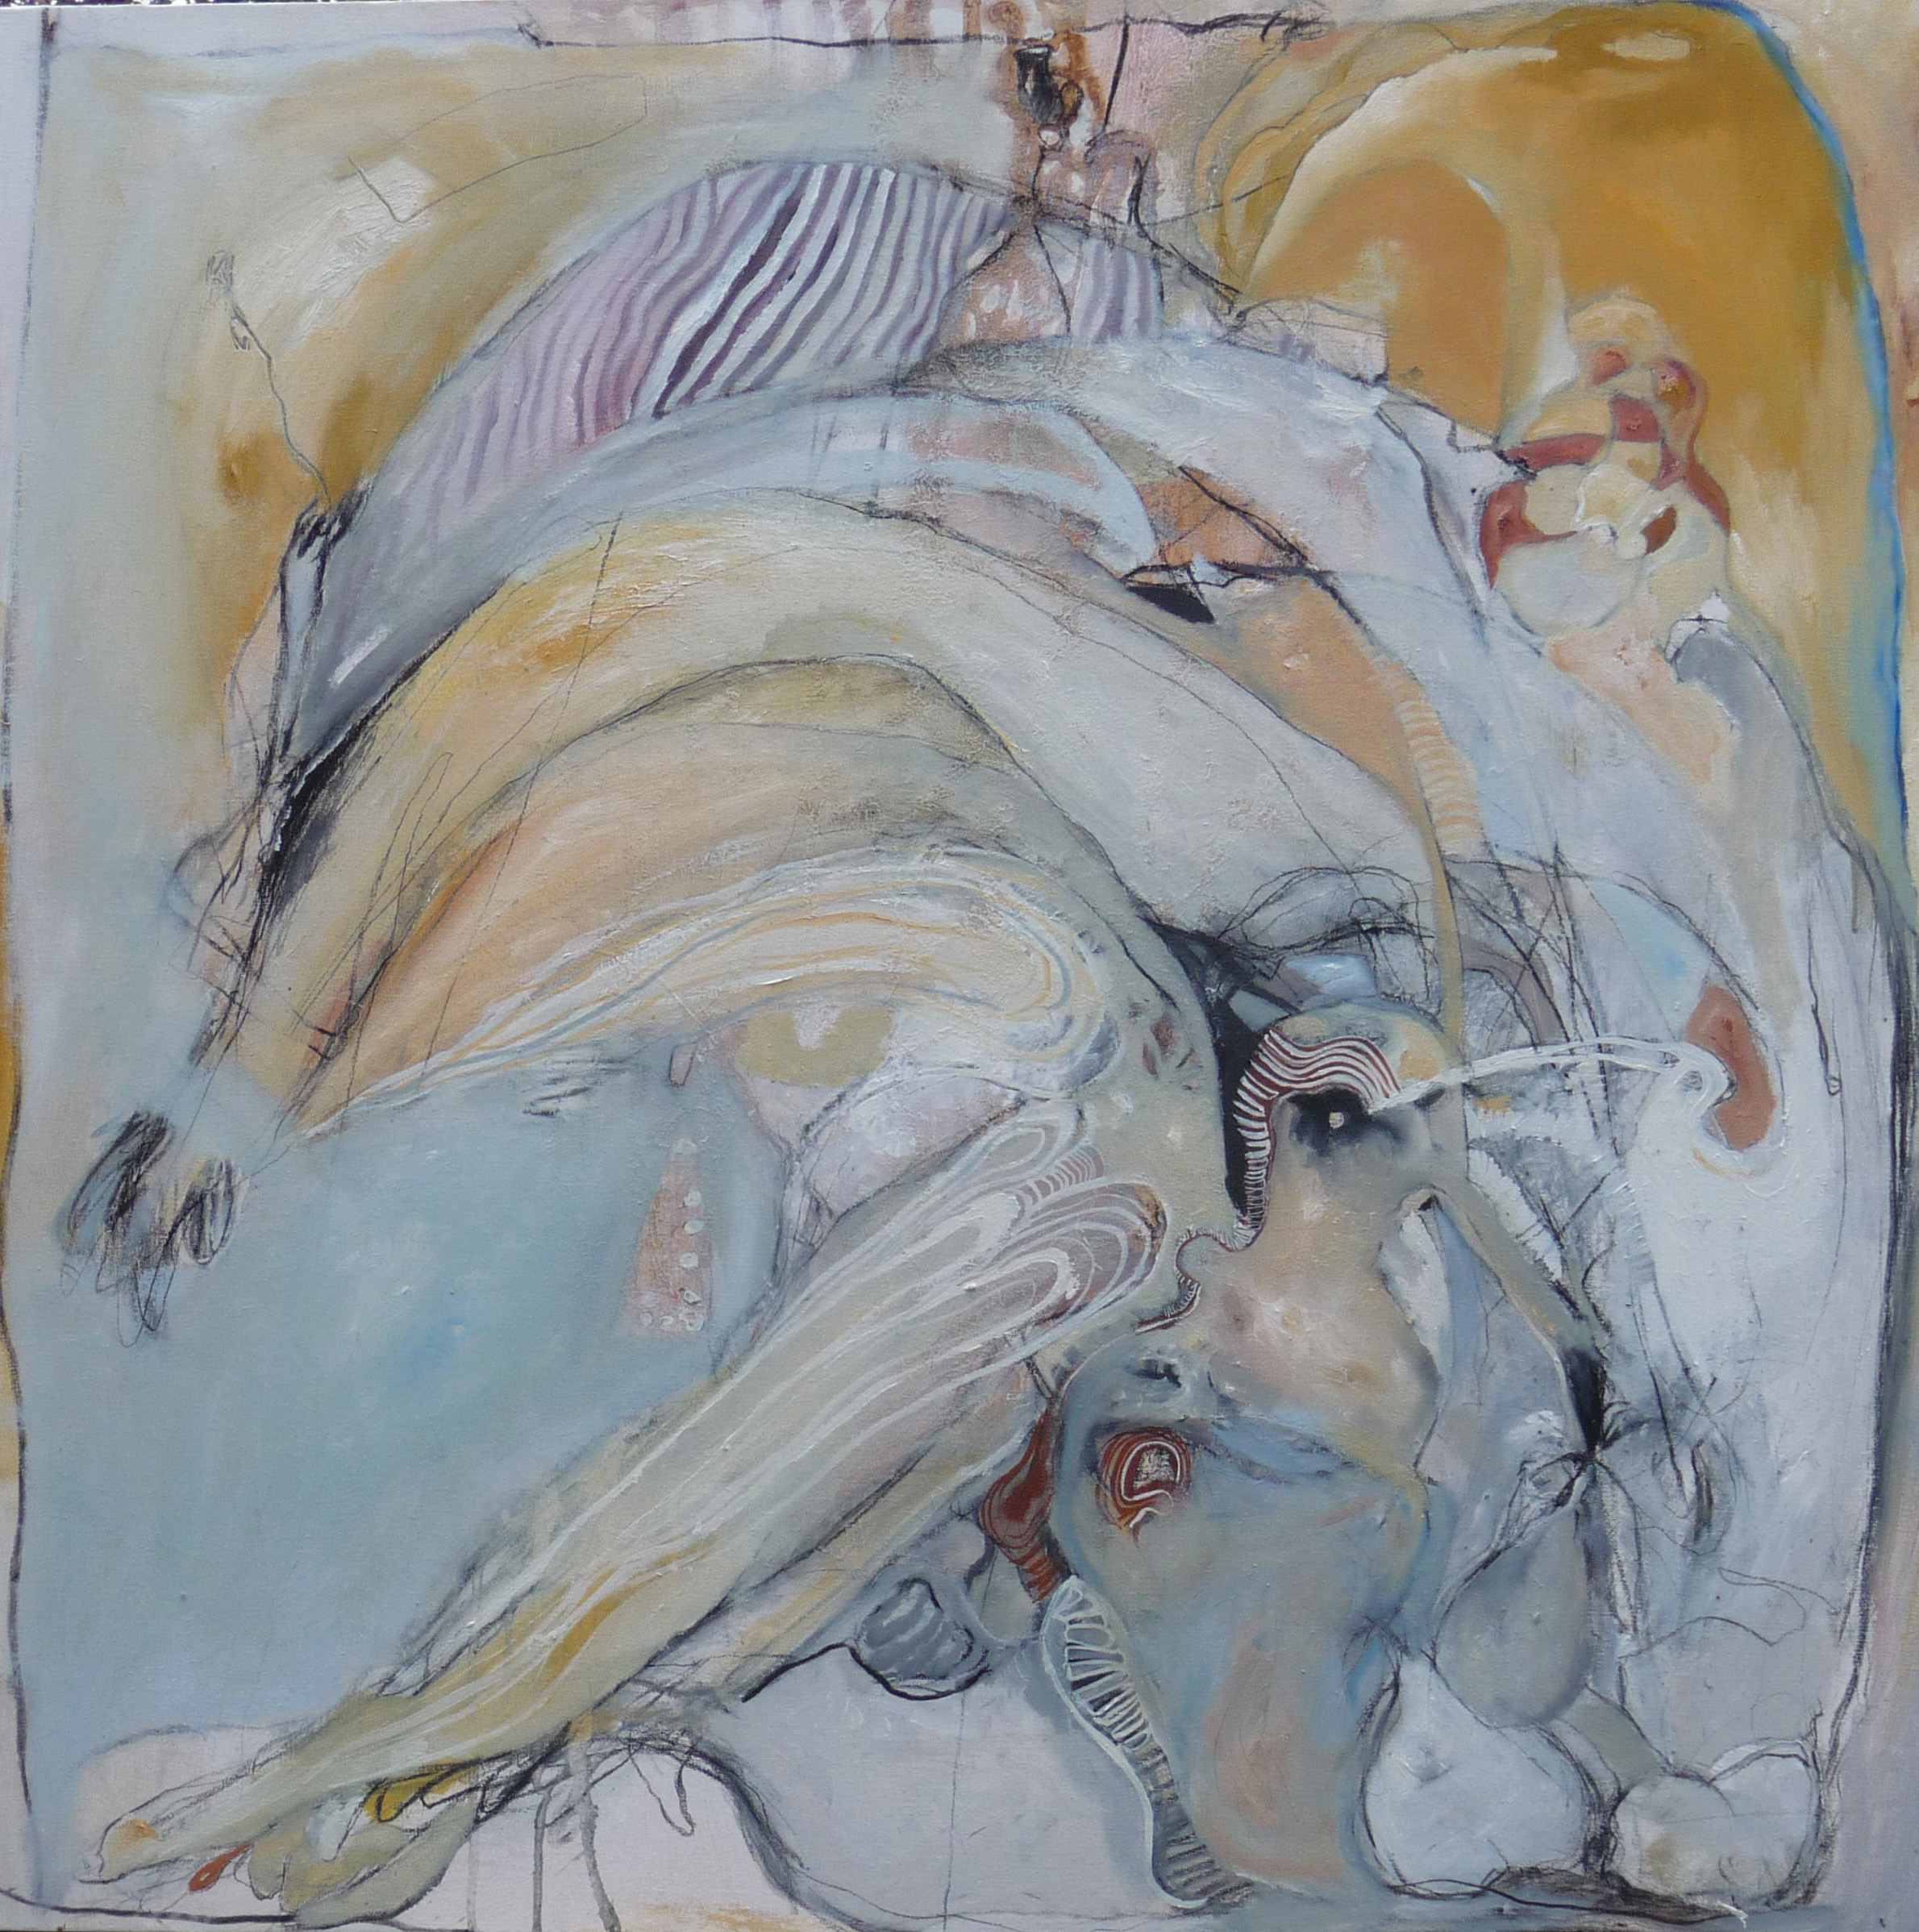 Bird Watching Leg Watching 2015  Acrylic on canvas  90 x 90cm